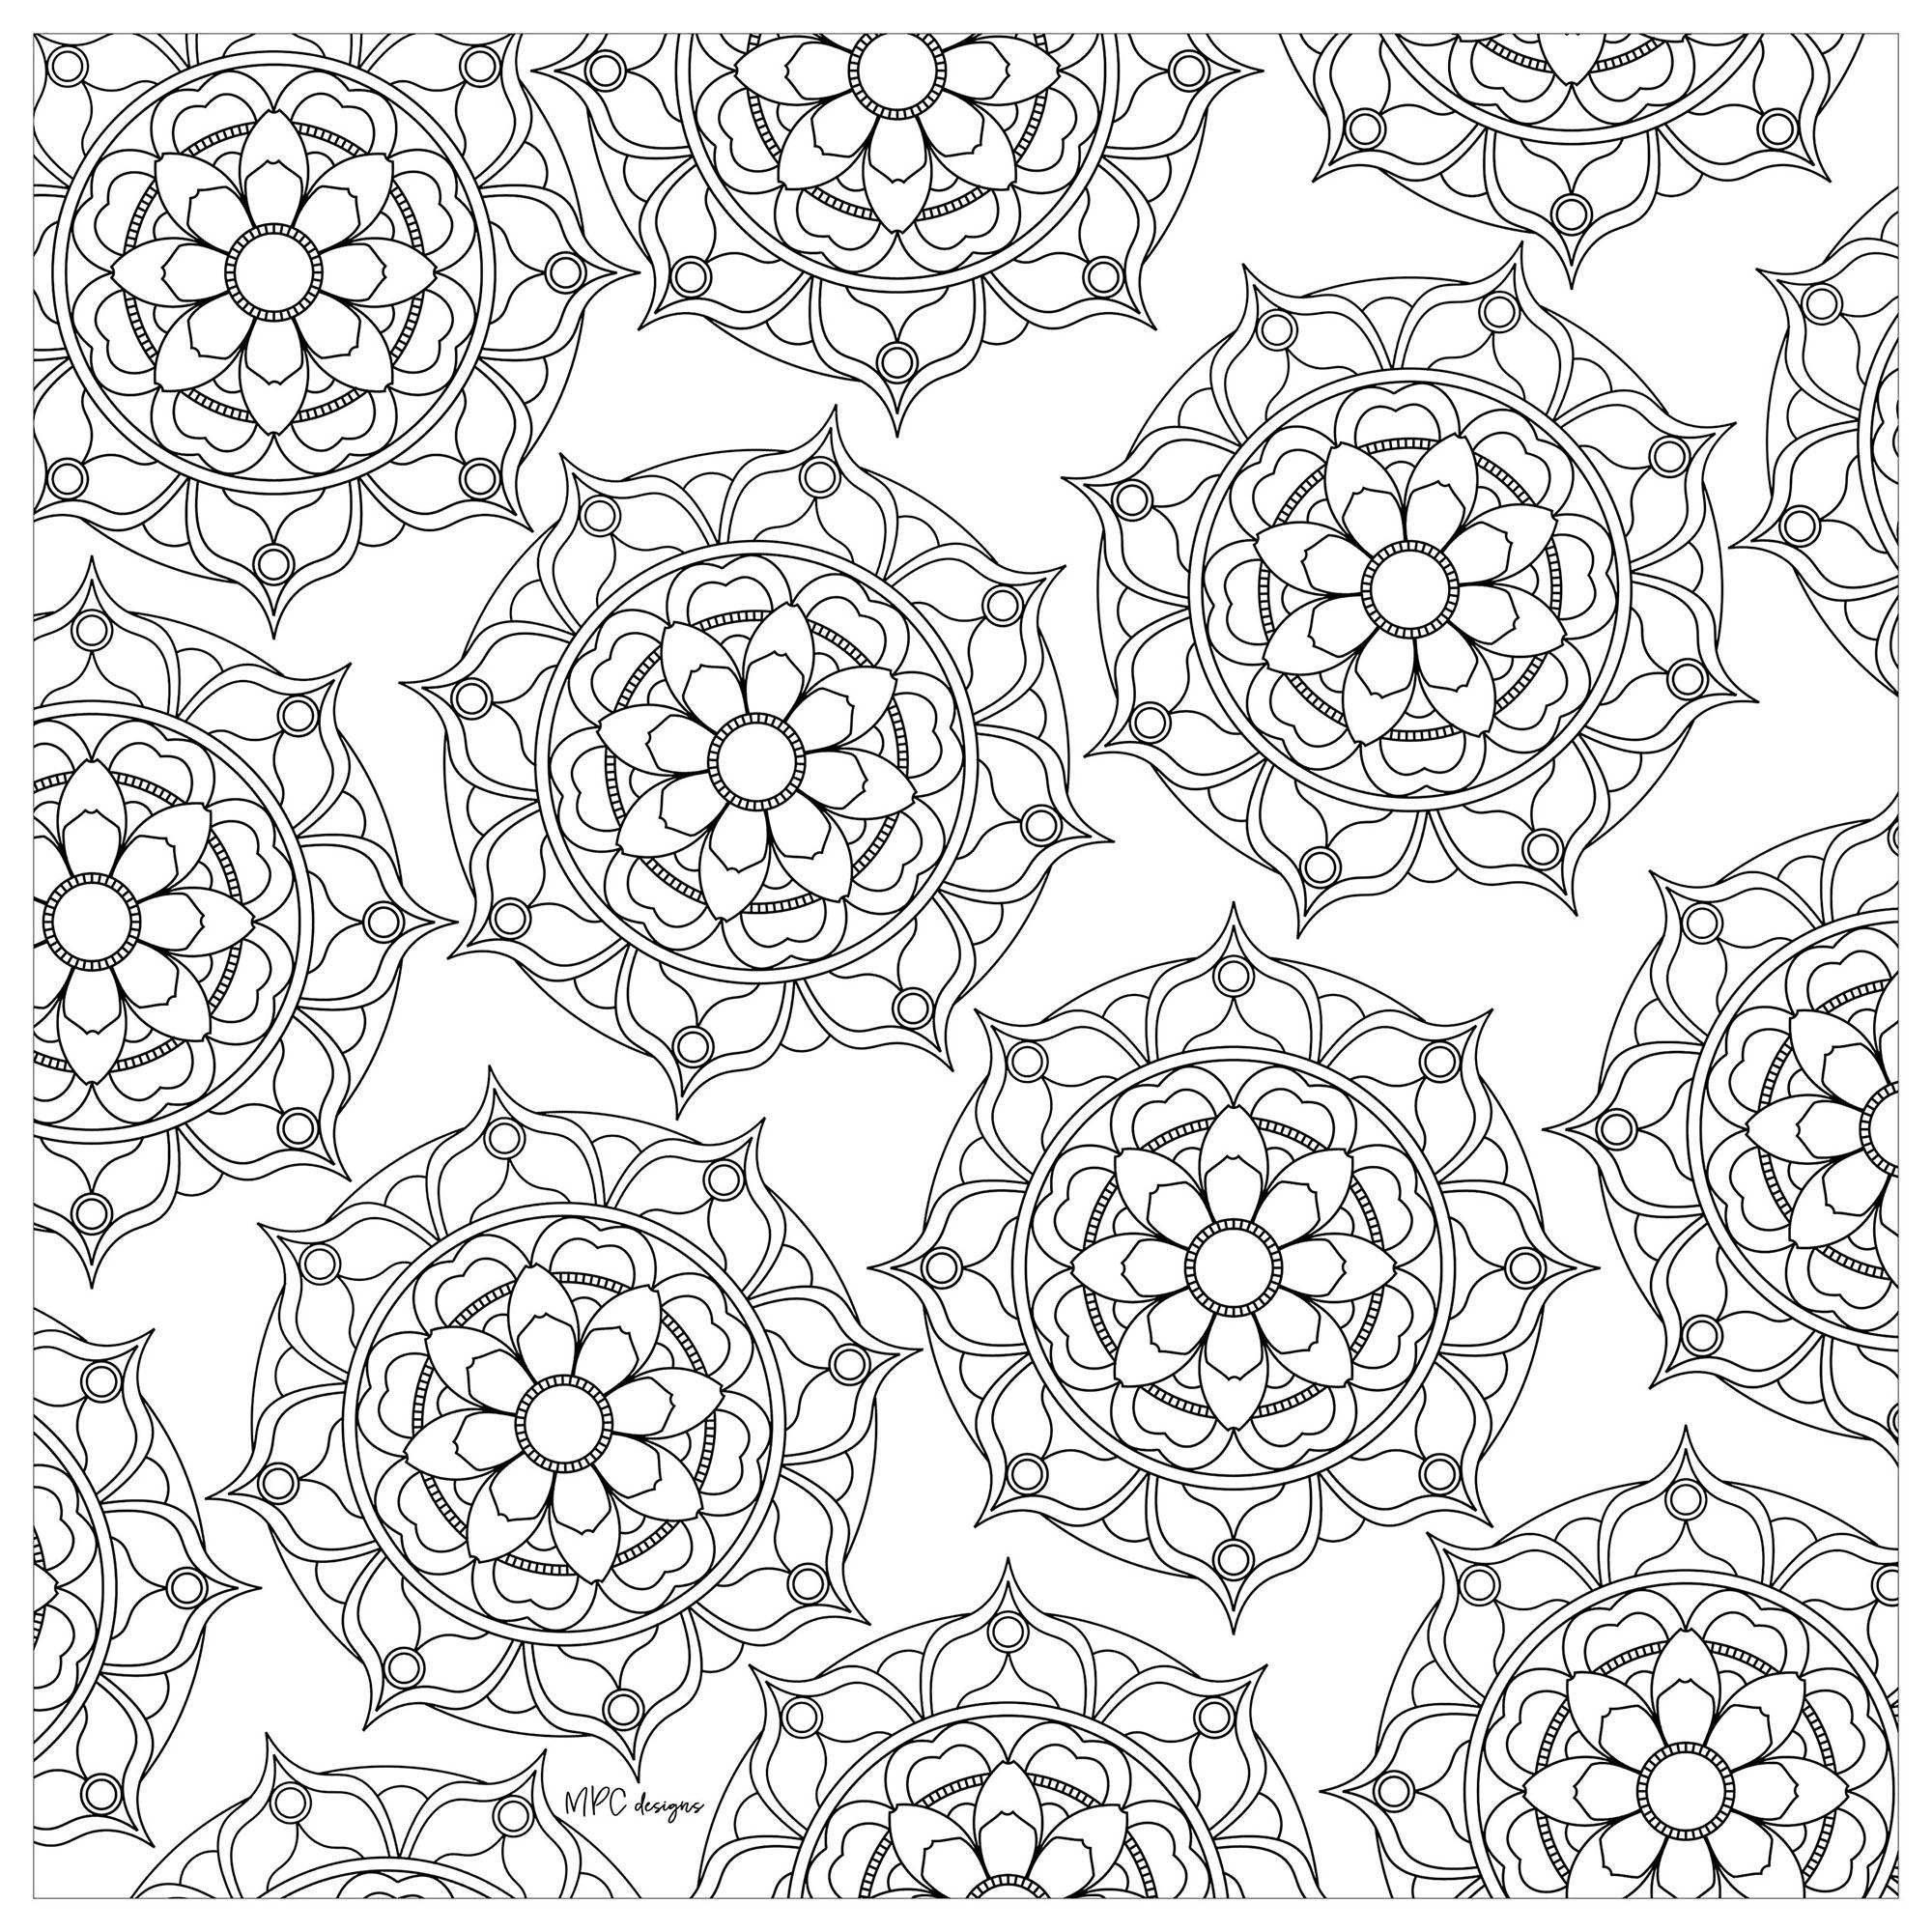 Mandala Gratuit Mpc Design 11 Difficult Mandalas For